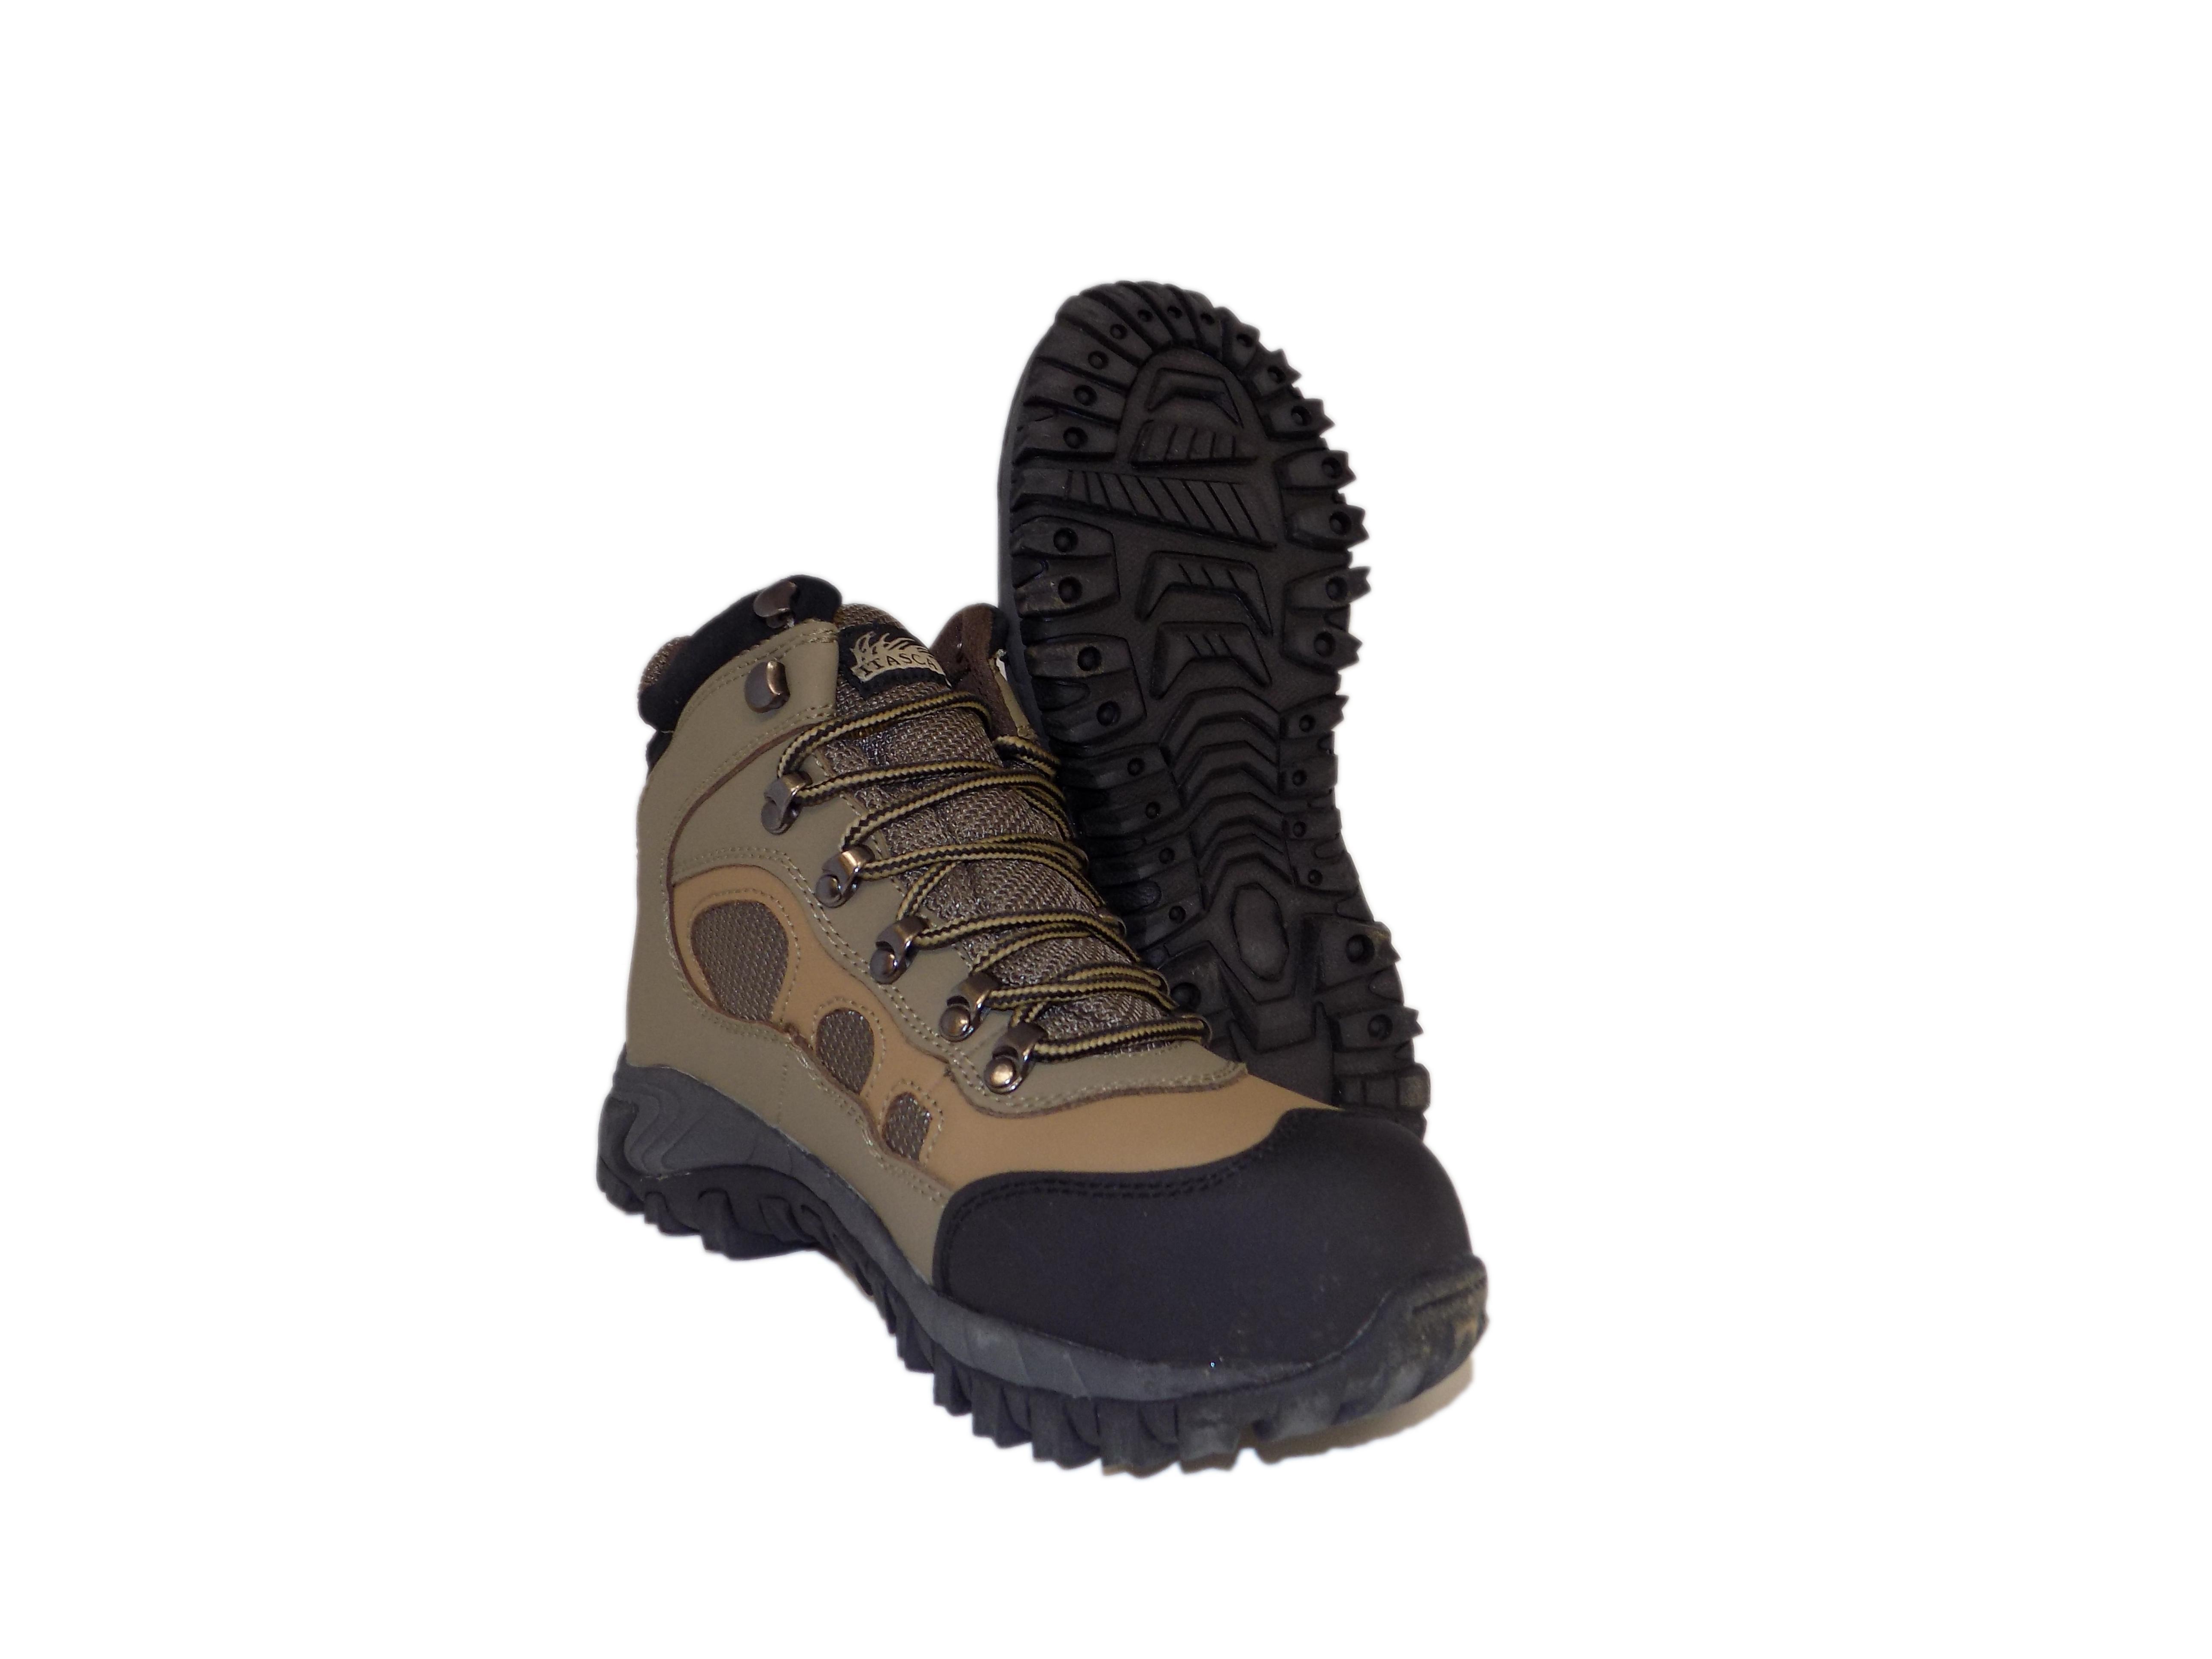 Itasca HARD COMMERCE Mens Waterproof Steel Toe Hiking Boots by Itasca